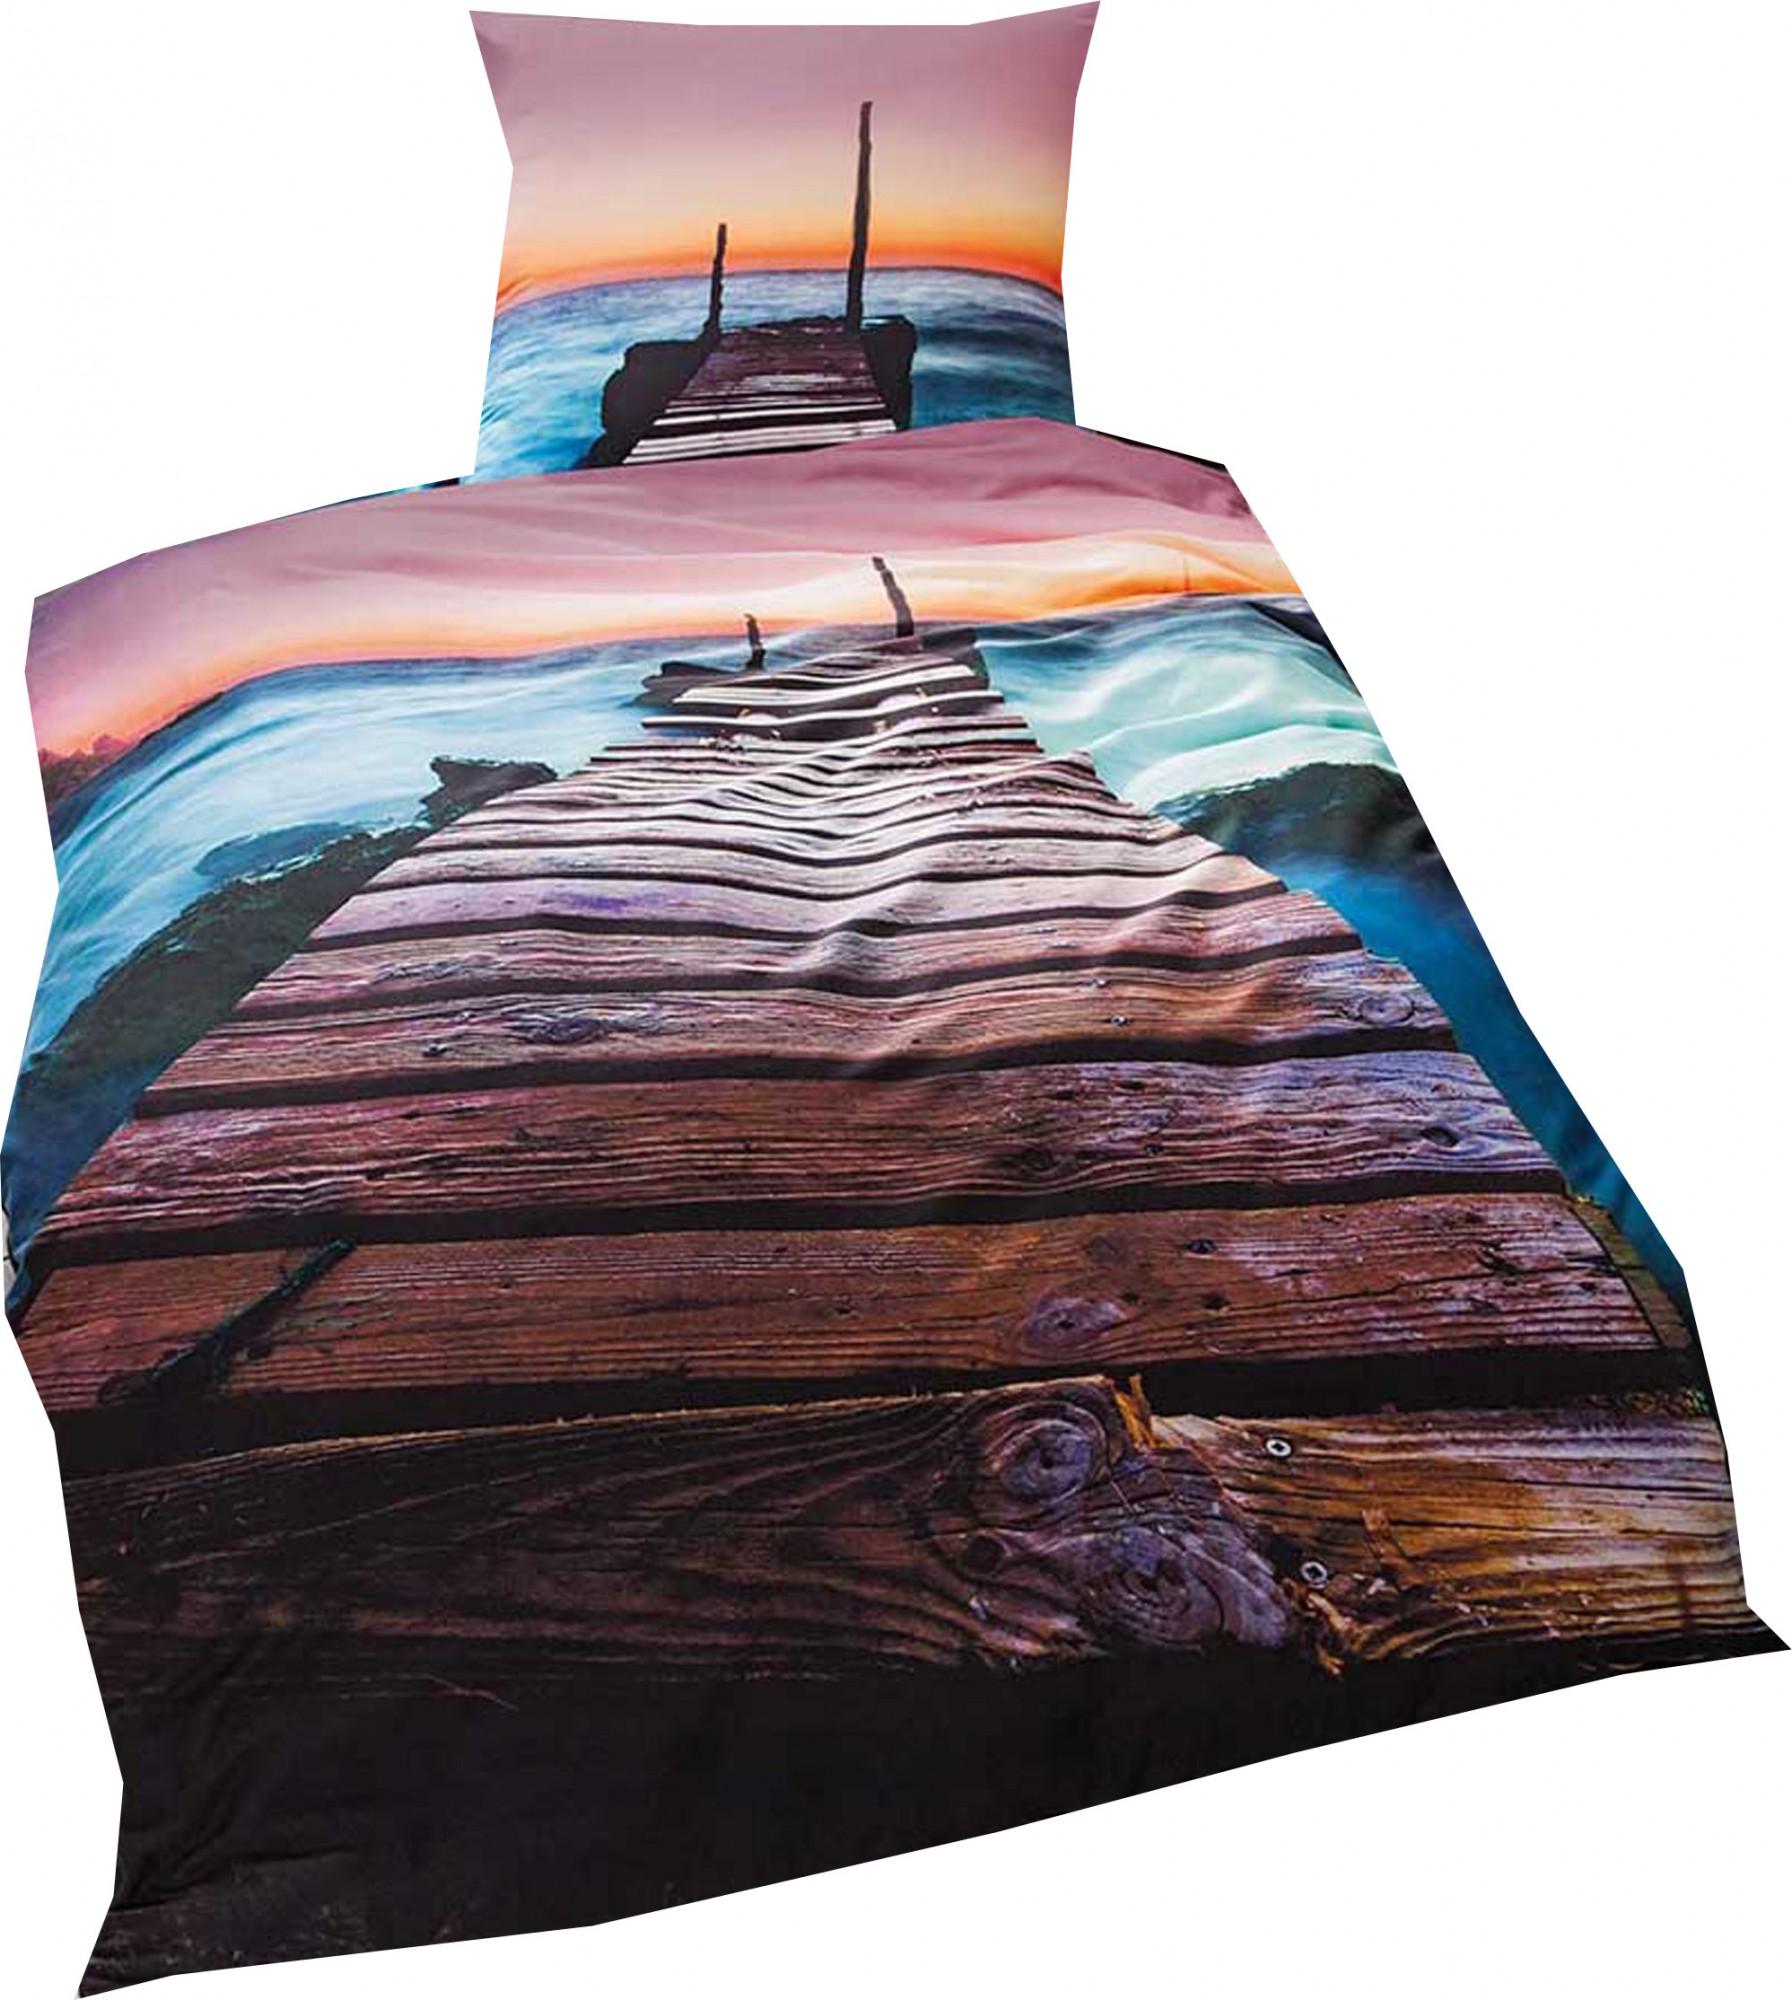 kaeppel mako satin digitaldruck bettw sche ibiza gr e 135x200 80x80 cm farbe aqua bettw sche. Black Bedroom Furniture Sets. Home Design Ideas